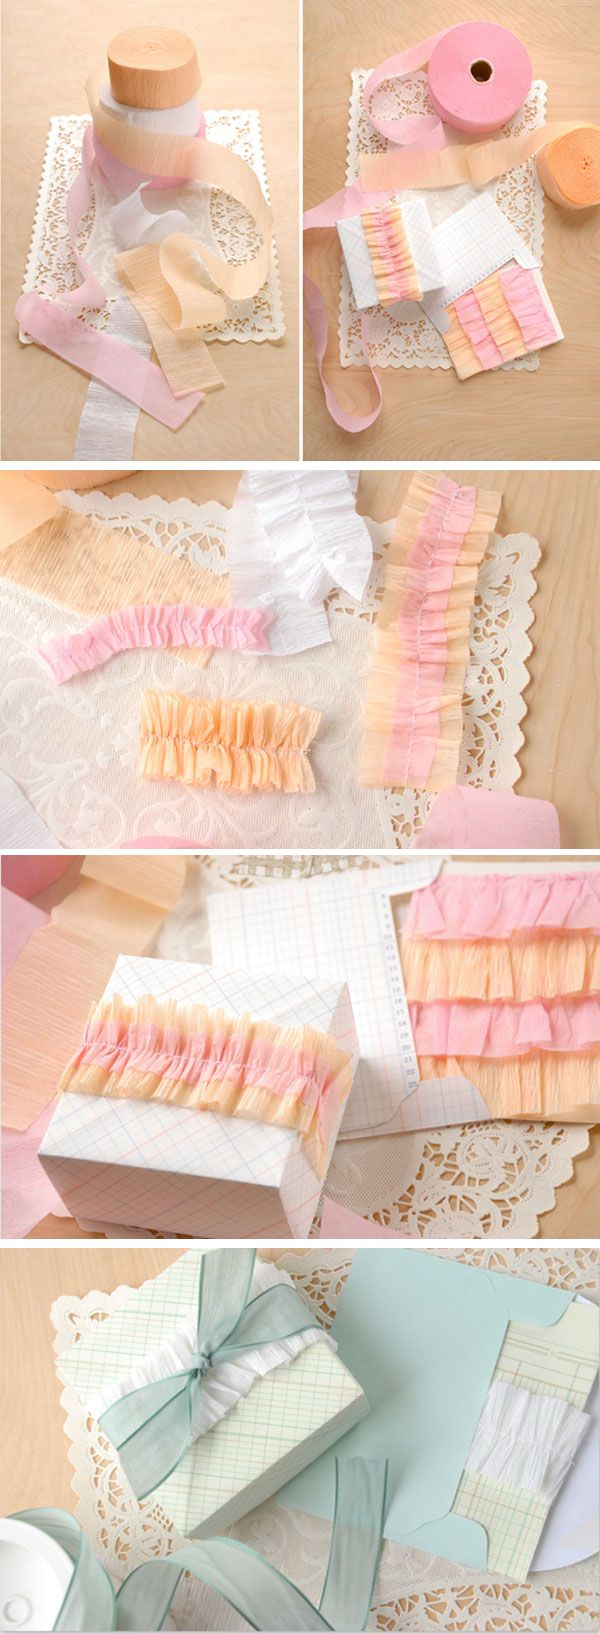 crepe paper, streamer (?)Tissue paper wrap